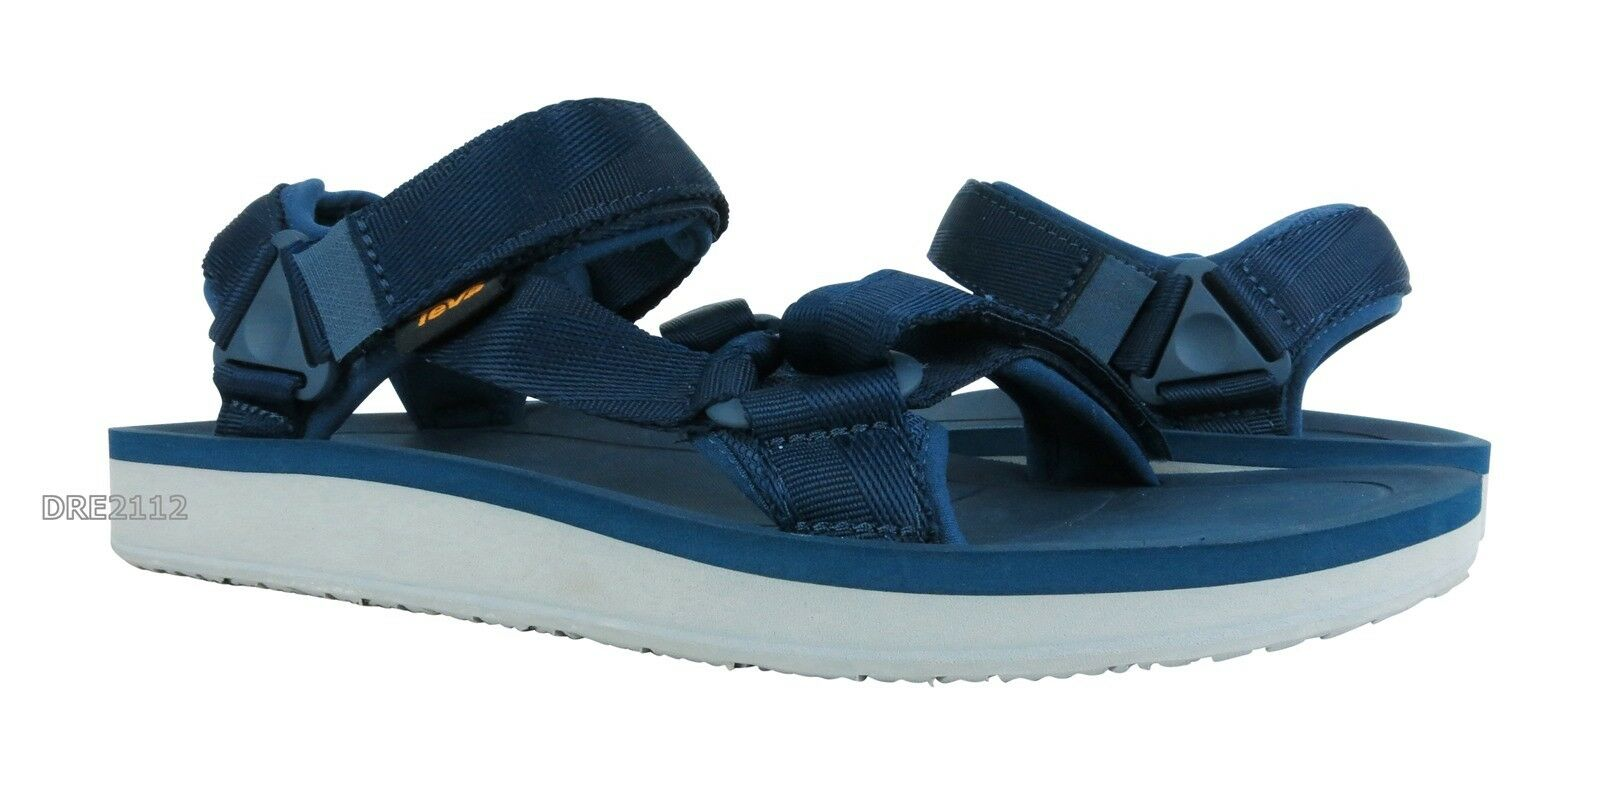 Teva Original Universal Premier Navy bluee Sandals Mens Size 12 NEW